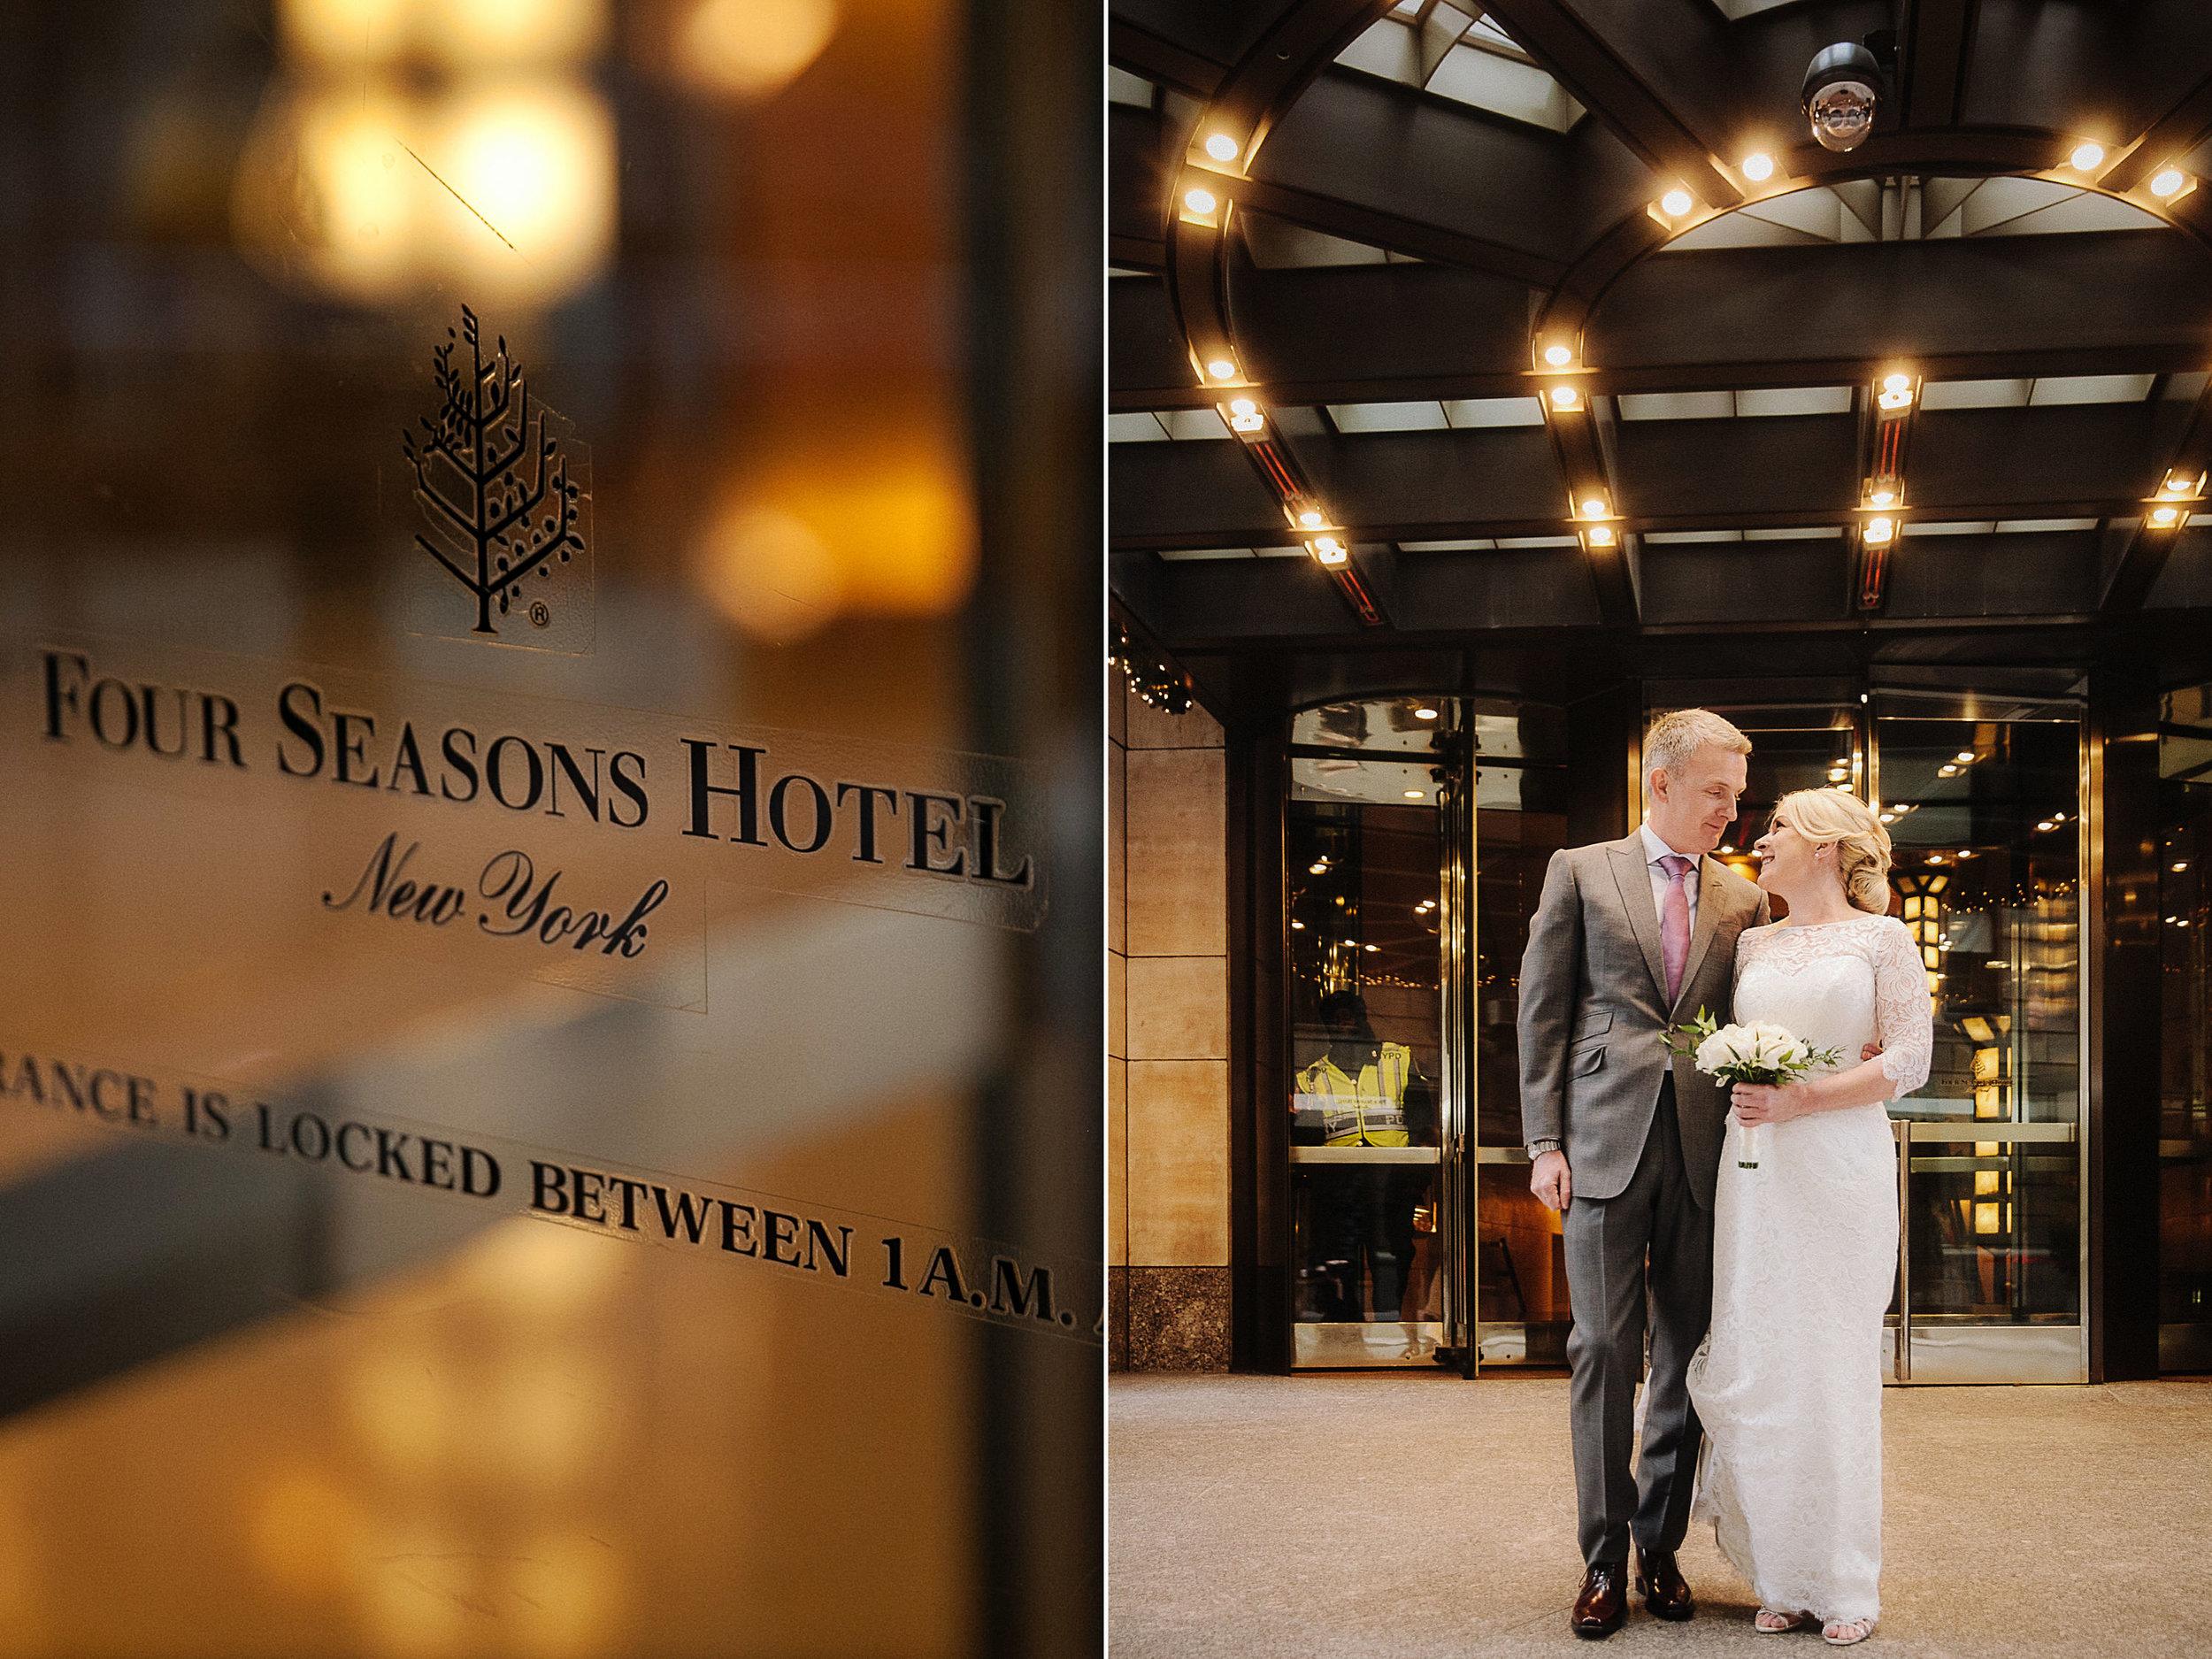 S&B_fourseasons_hotel_nyc_elopement_10.jpg